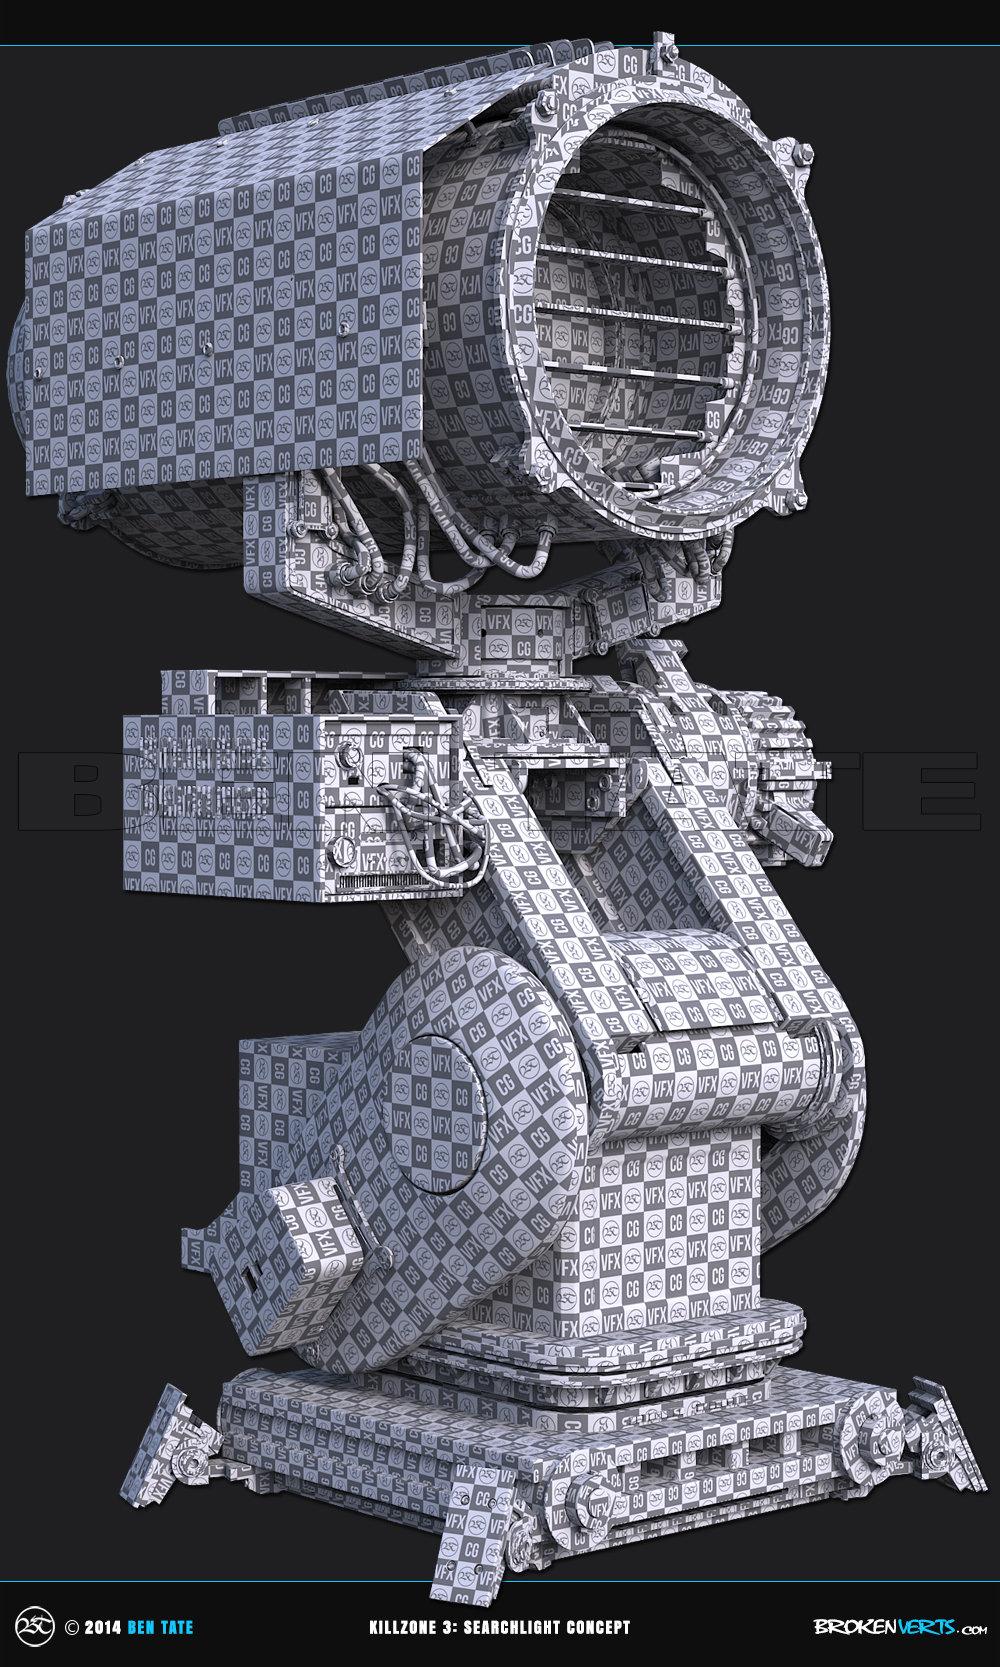 Killzone Searchlight Concept 3ds Max UVs Unwrap 3D Model | Ben Tate | 3ds Max V-Ray | 3d CG VFX